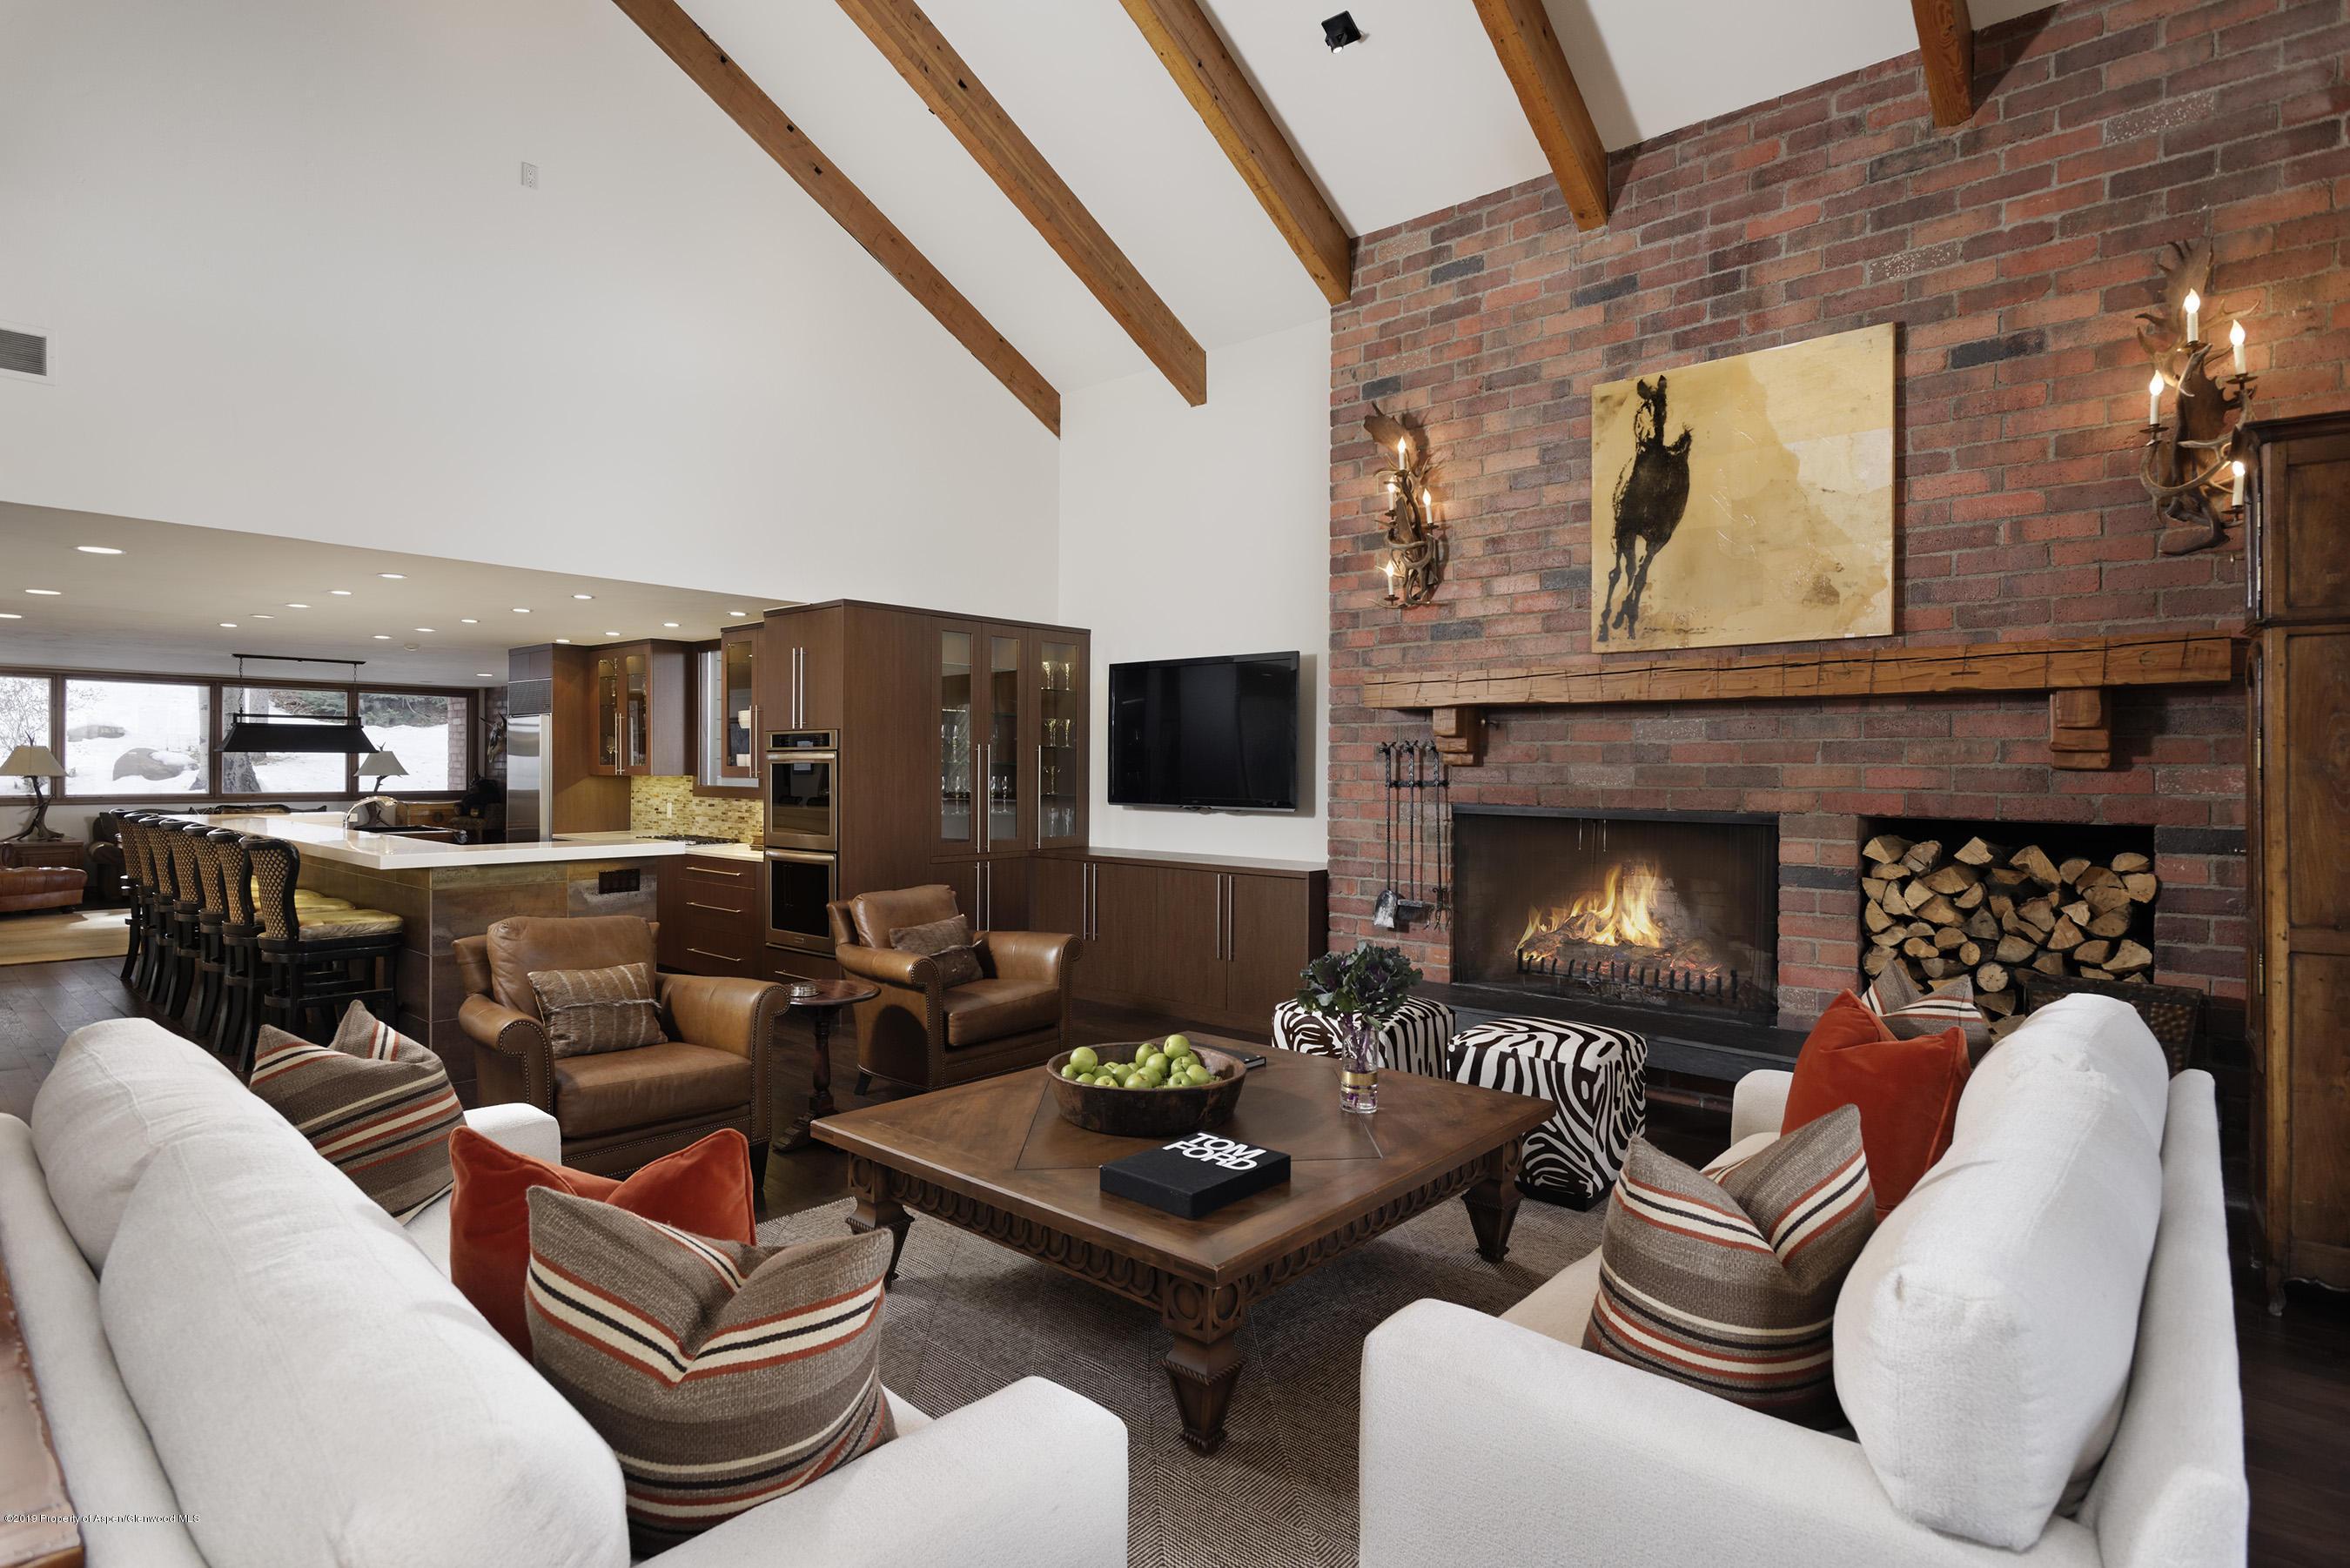 84 Forest Lane - Snowmass Village, Colorado